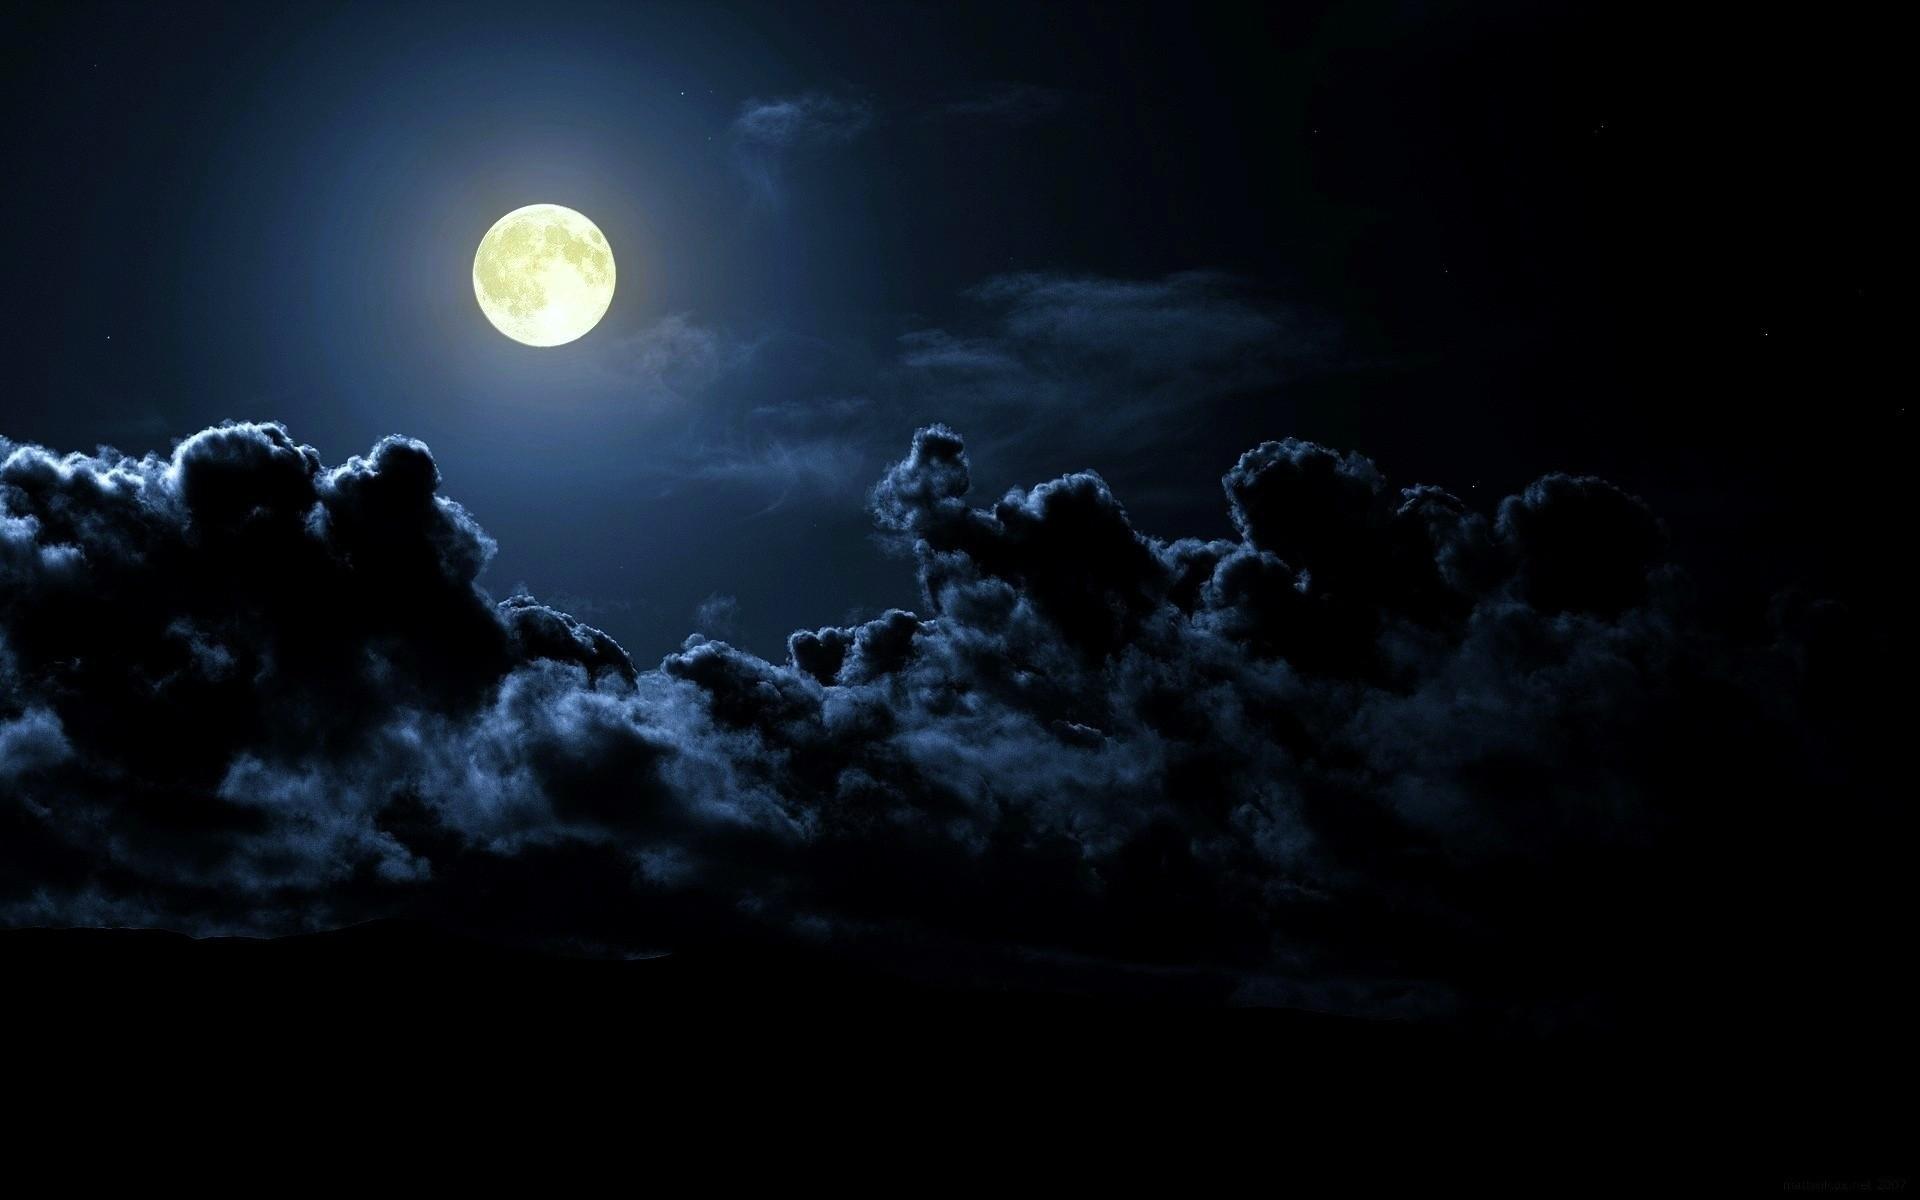 Full Moon Night Phone Wallpapers